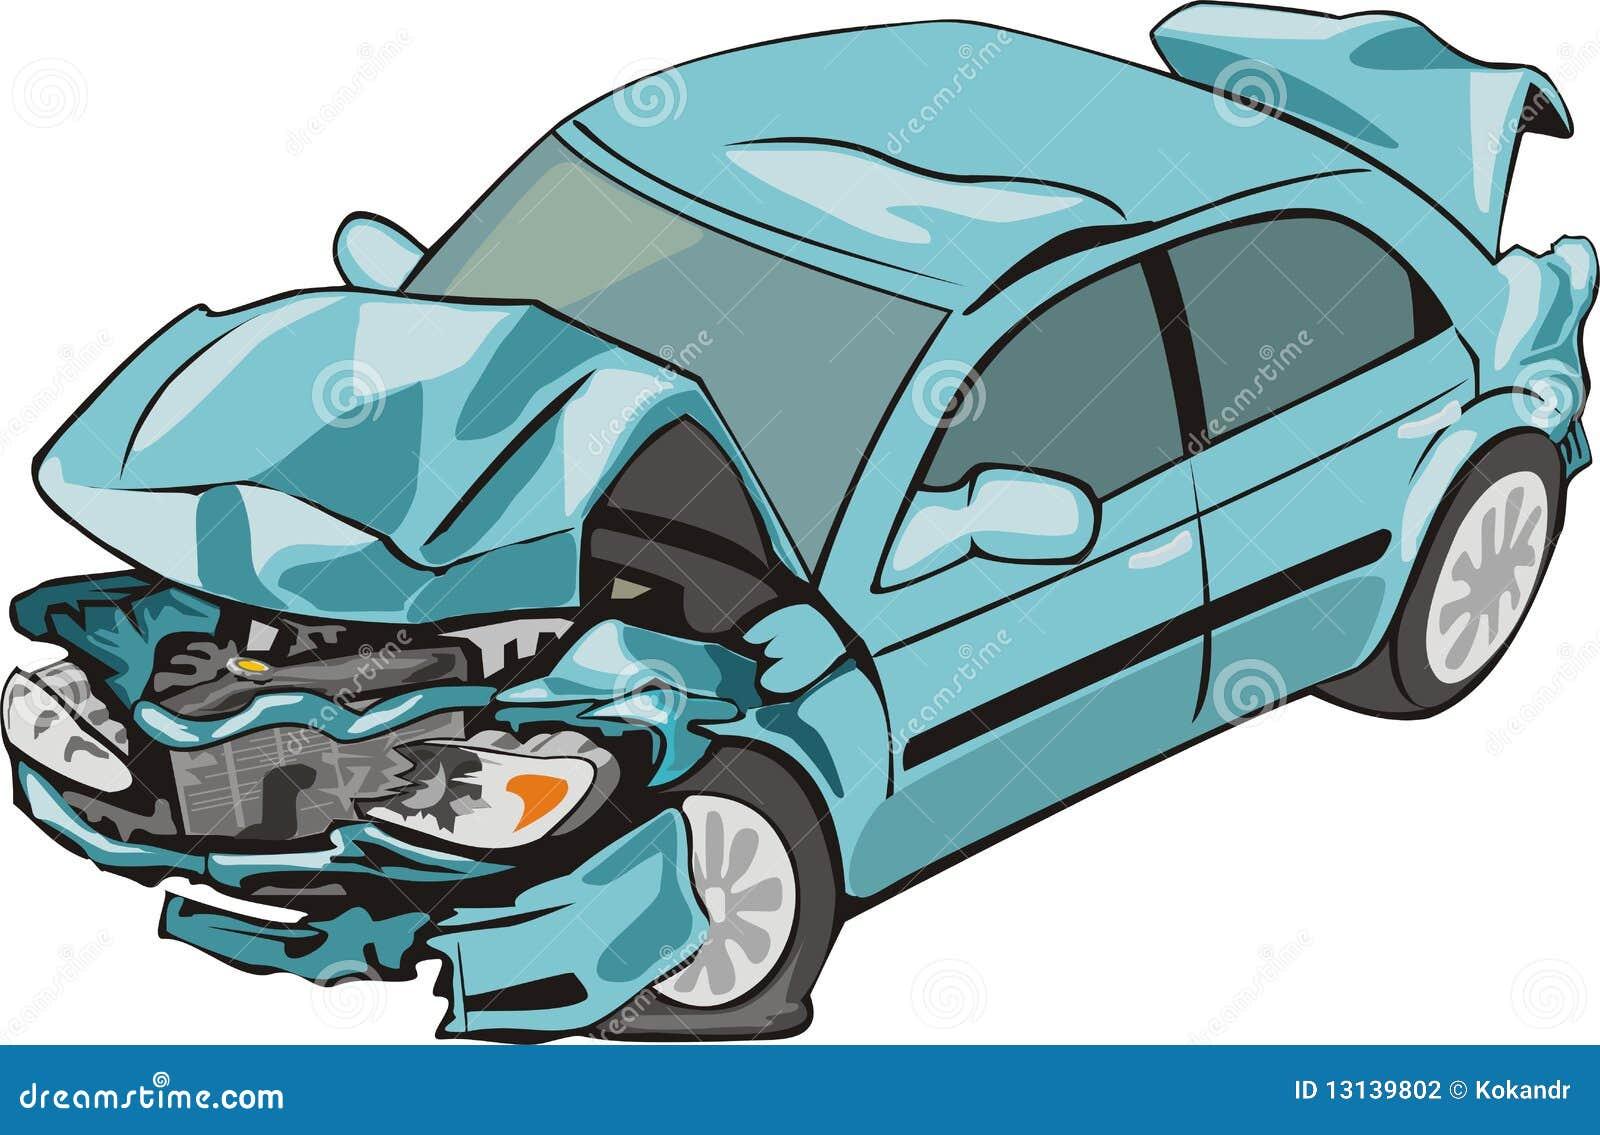 Wrecked Car Cartoon